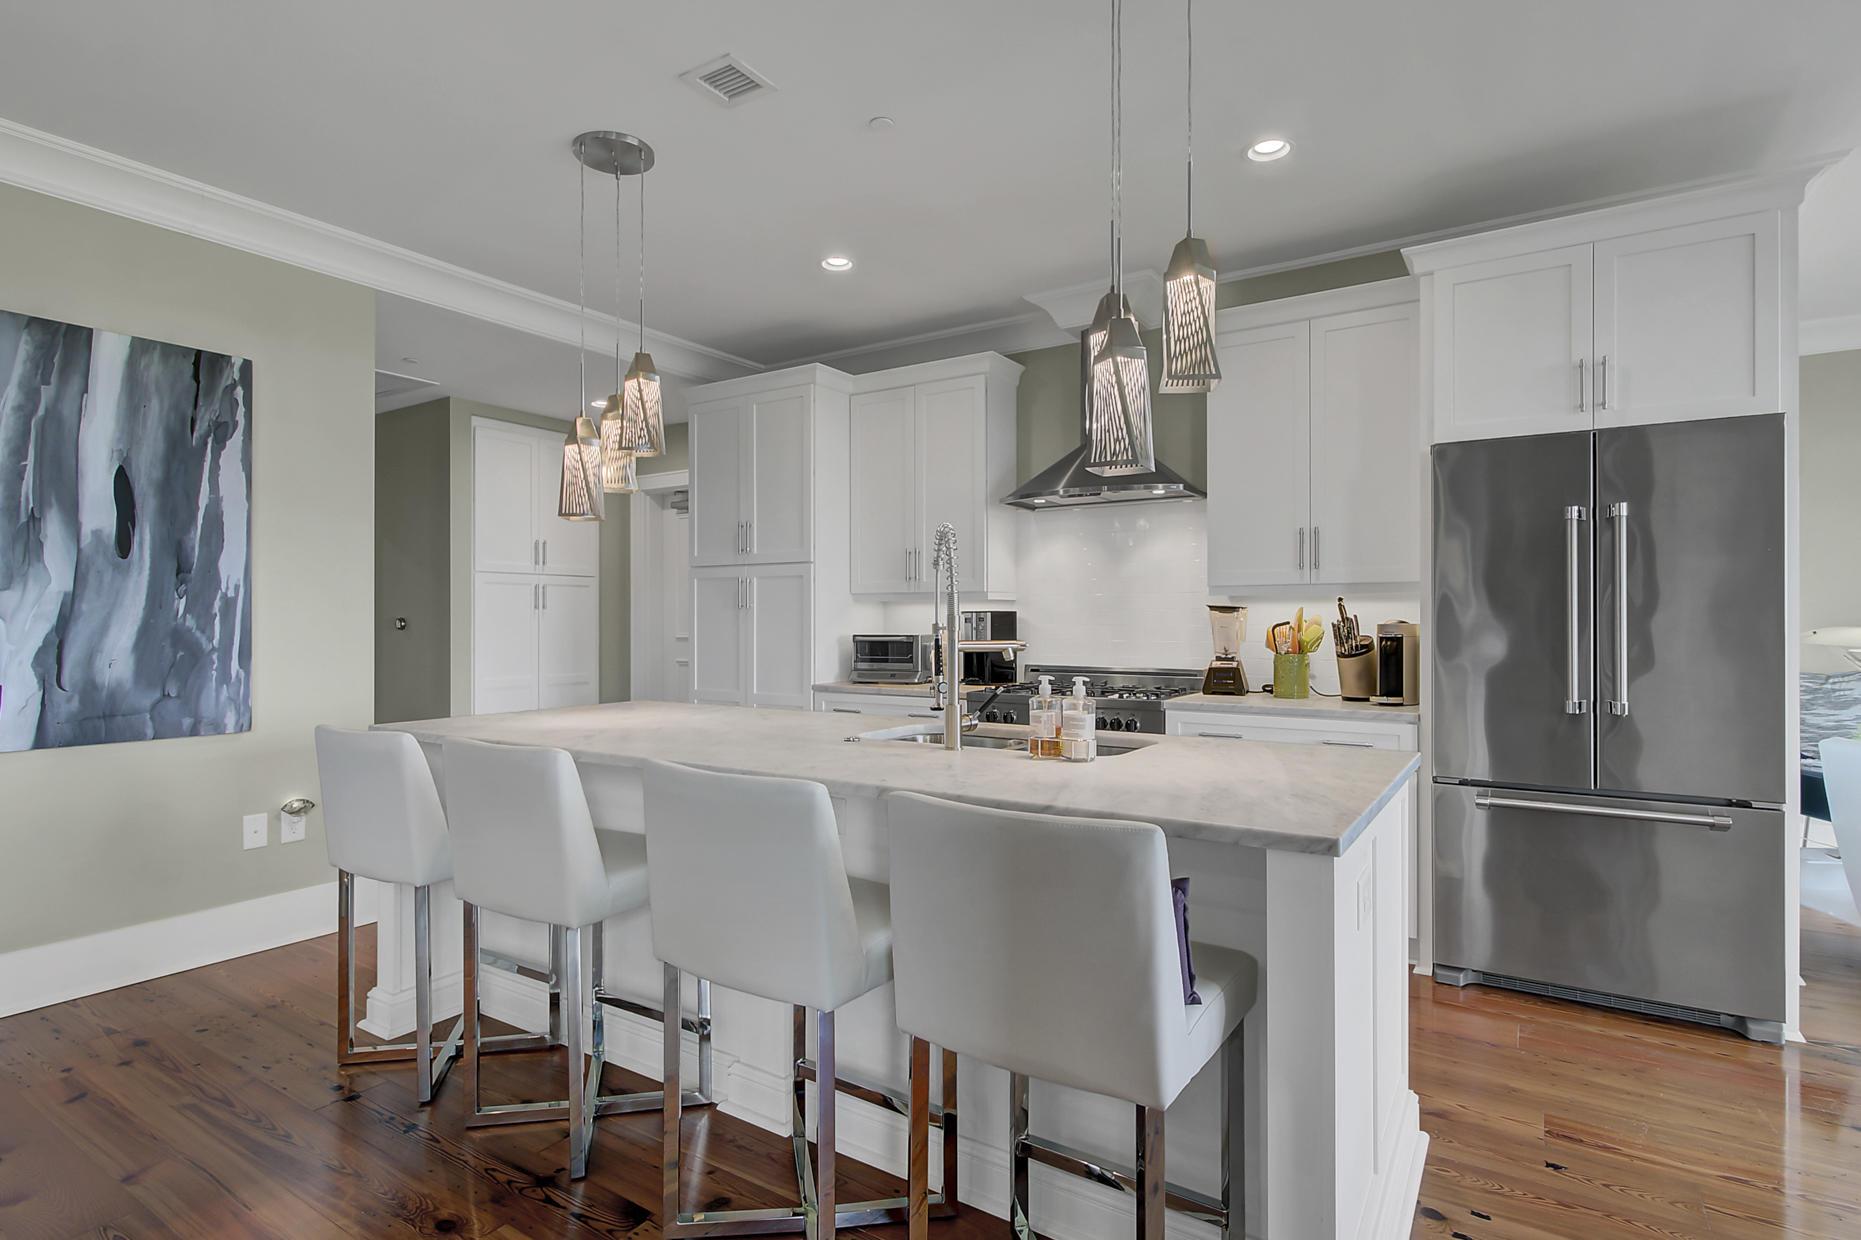 Tides IV Condominiums Homes For Sale - 155 Wingo Way, Mount Pleasant, SC - 4